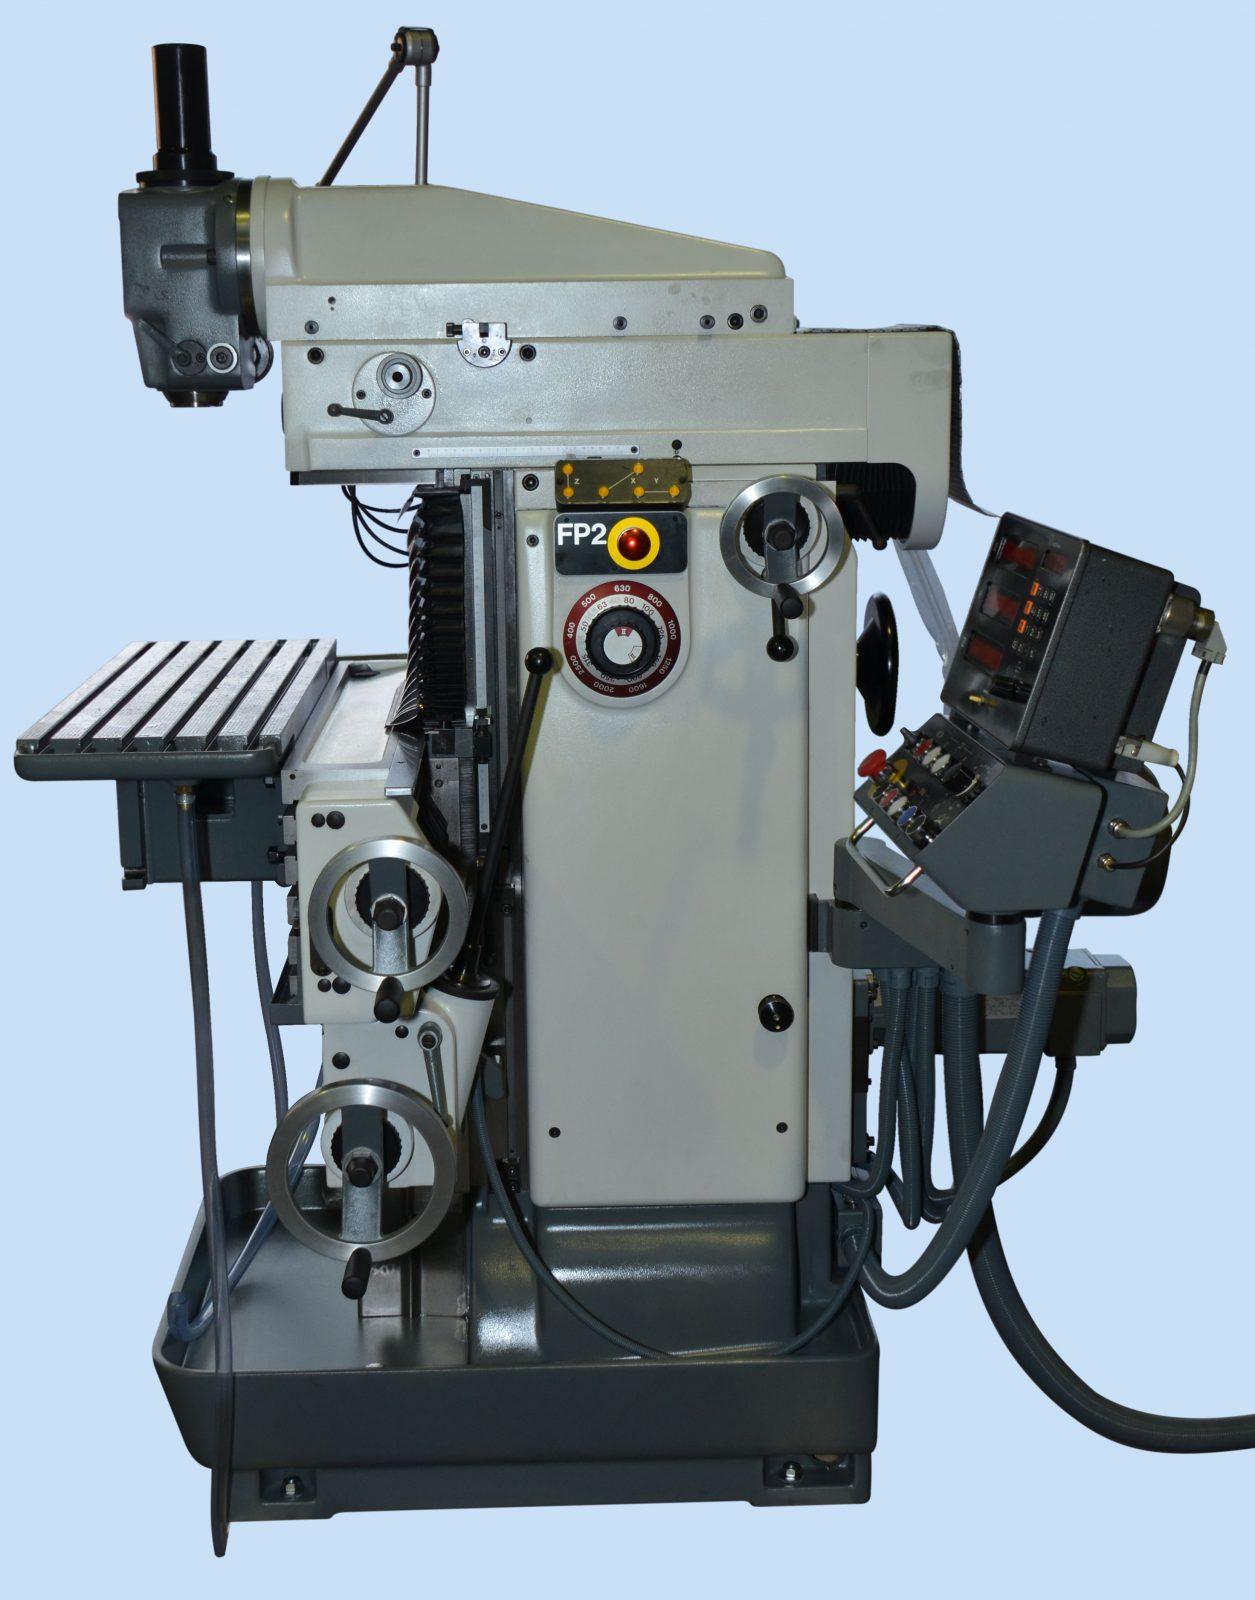 Fräsmaschine: Deckel FP 2 #2202 (Überholt)